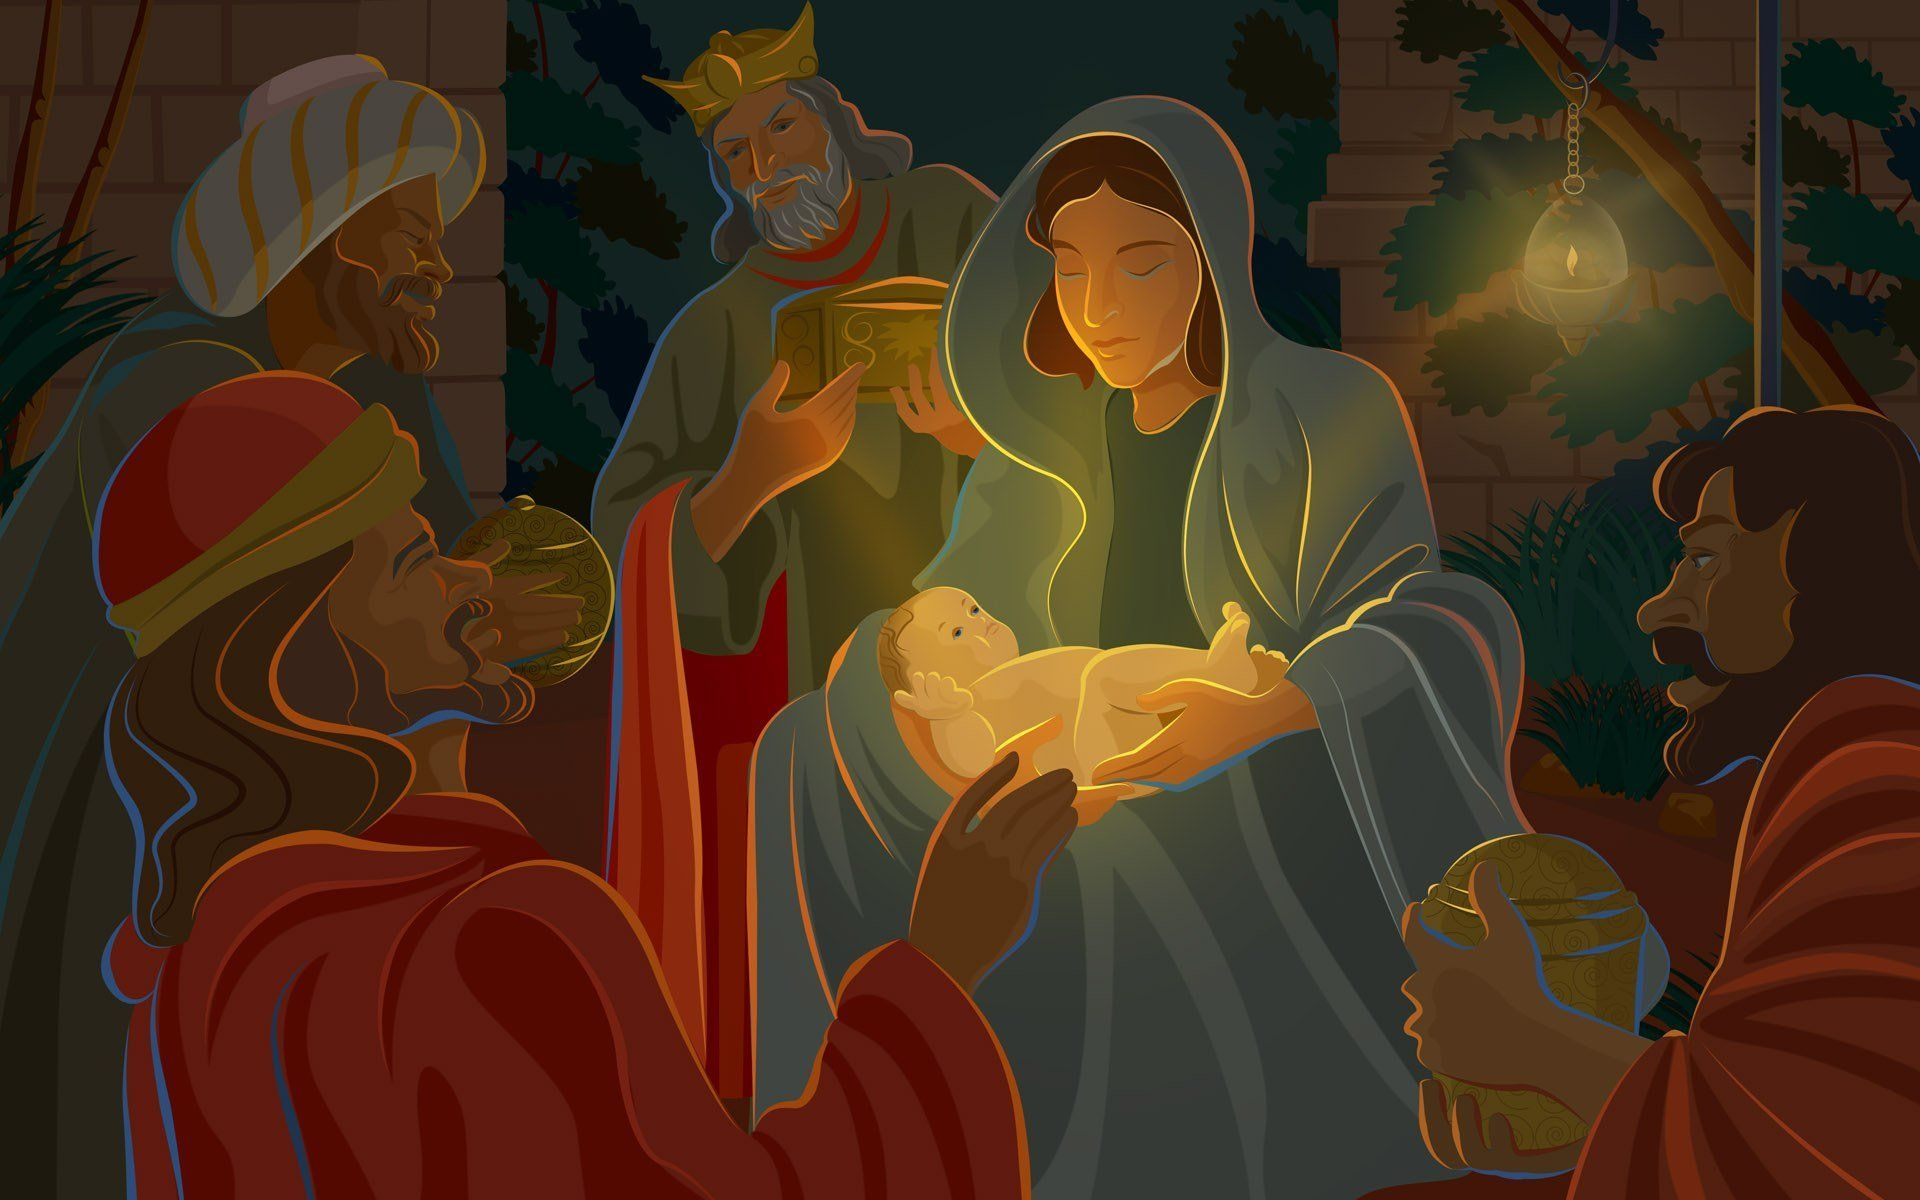 Holiday Desktop Jesus Birth Wallpaper Theme Scene Illustration Christmas Tree Virtual Nativity Jpg 1920 1200